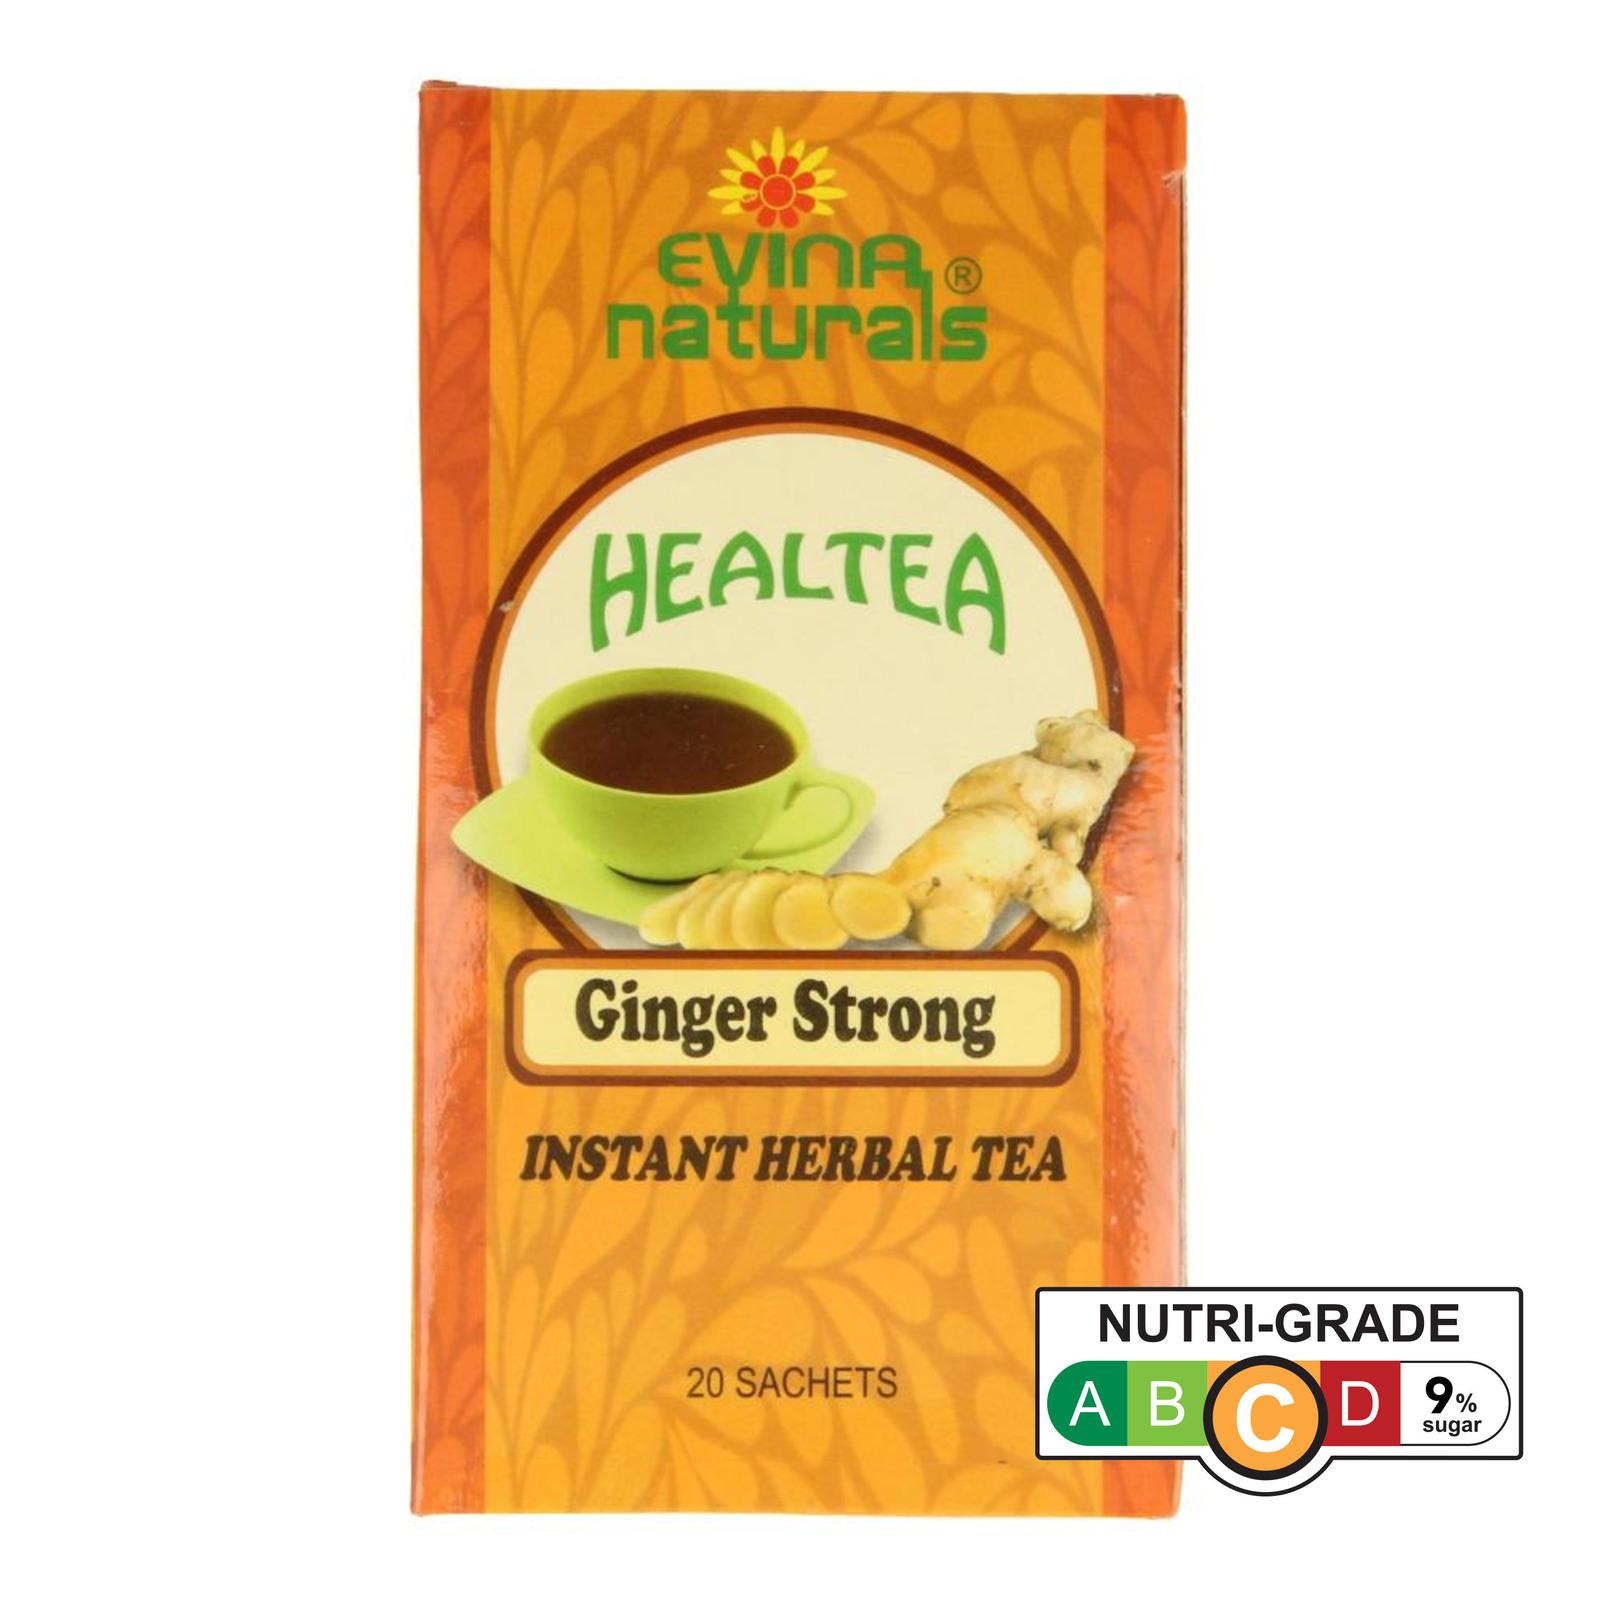 Evina Naturals Ginger Strong Herbal Tea 20 x 10g